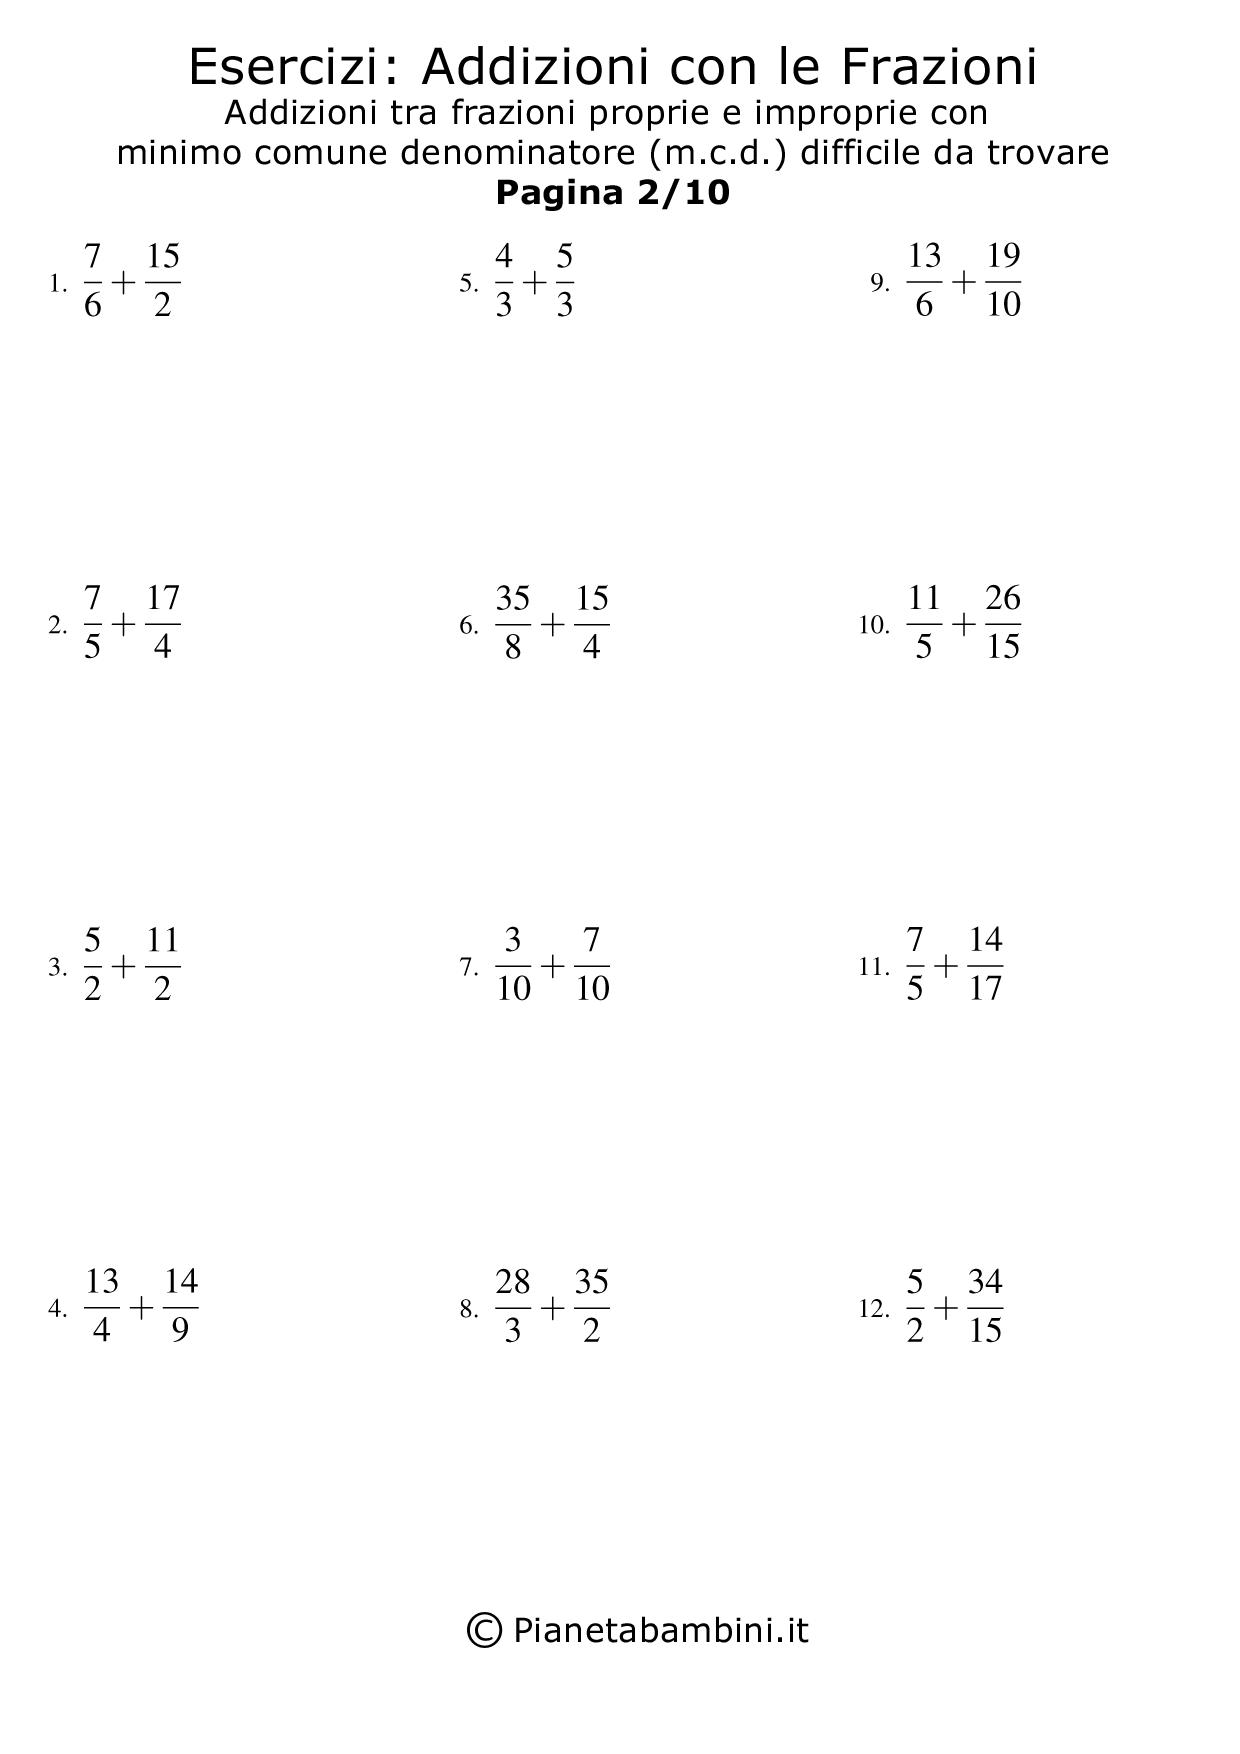 Frazioni-Proprie-Improprie-m.c.d-difficile_02